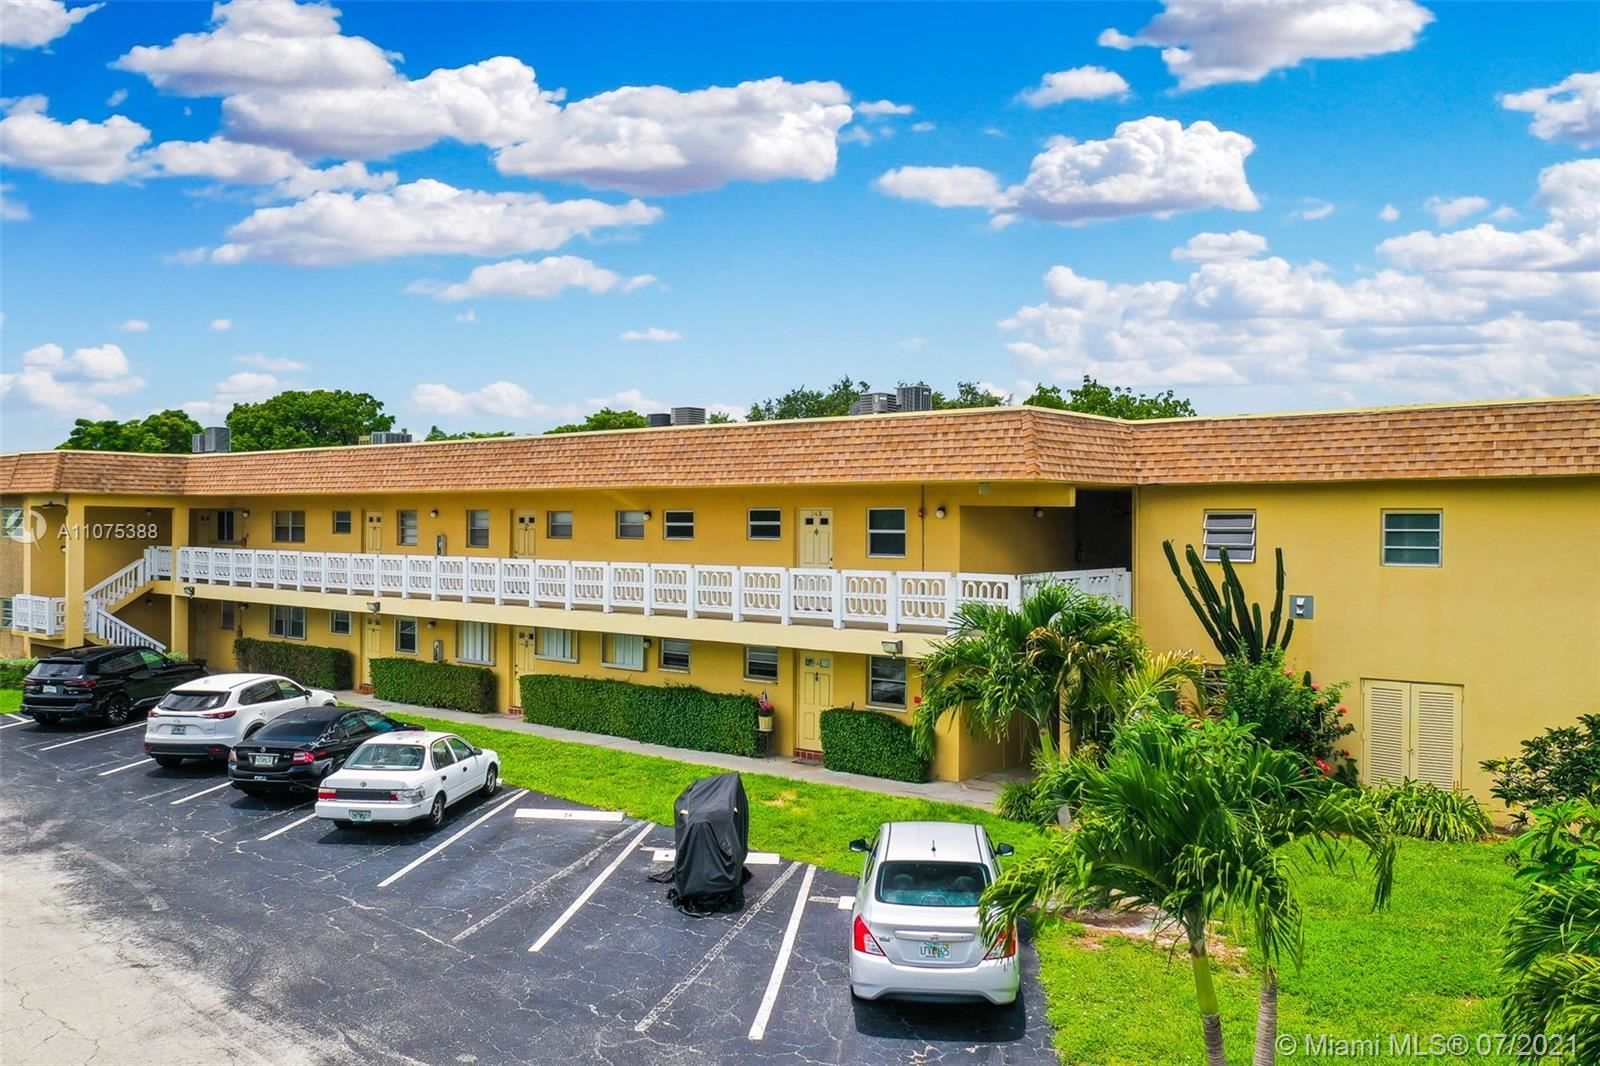 Photo of 5130 SW 40th Ave #24B, Dania Beach, FL 33314 (MLS # A11075388)